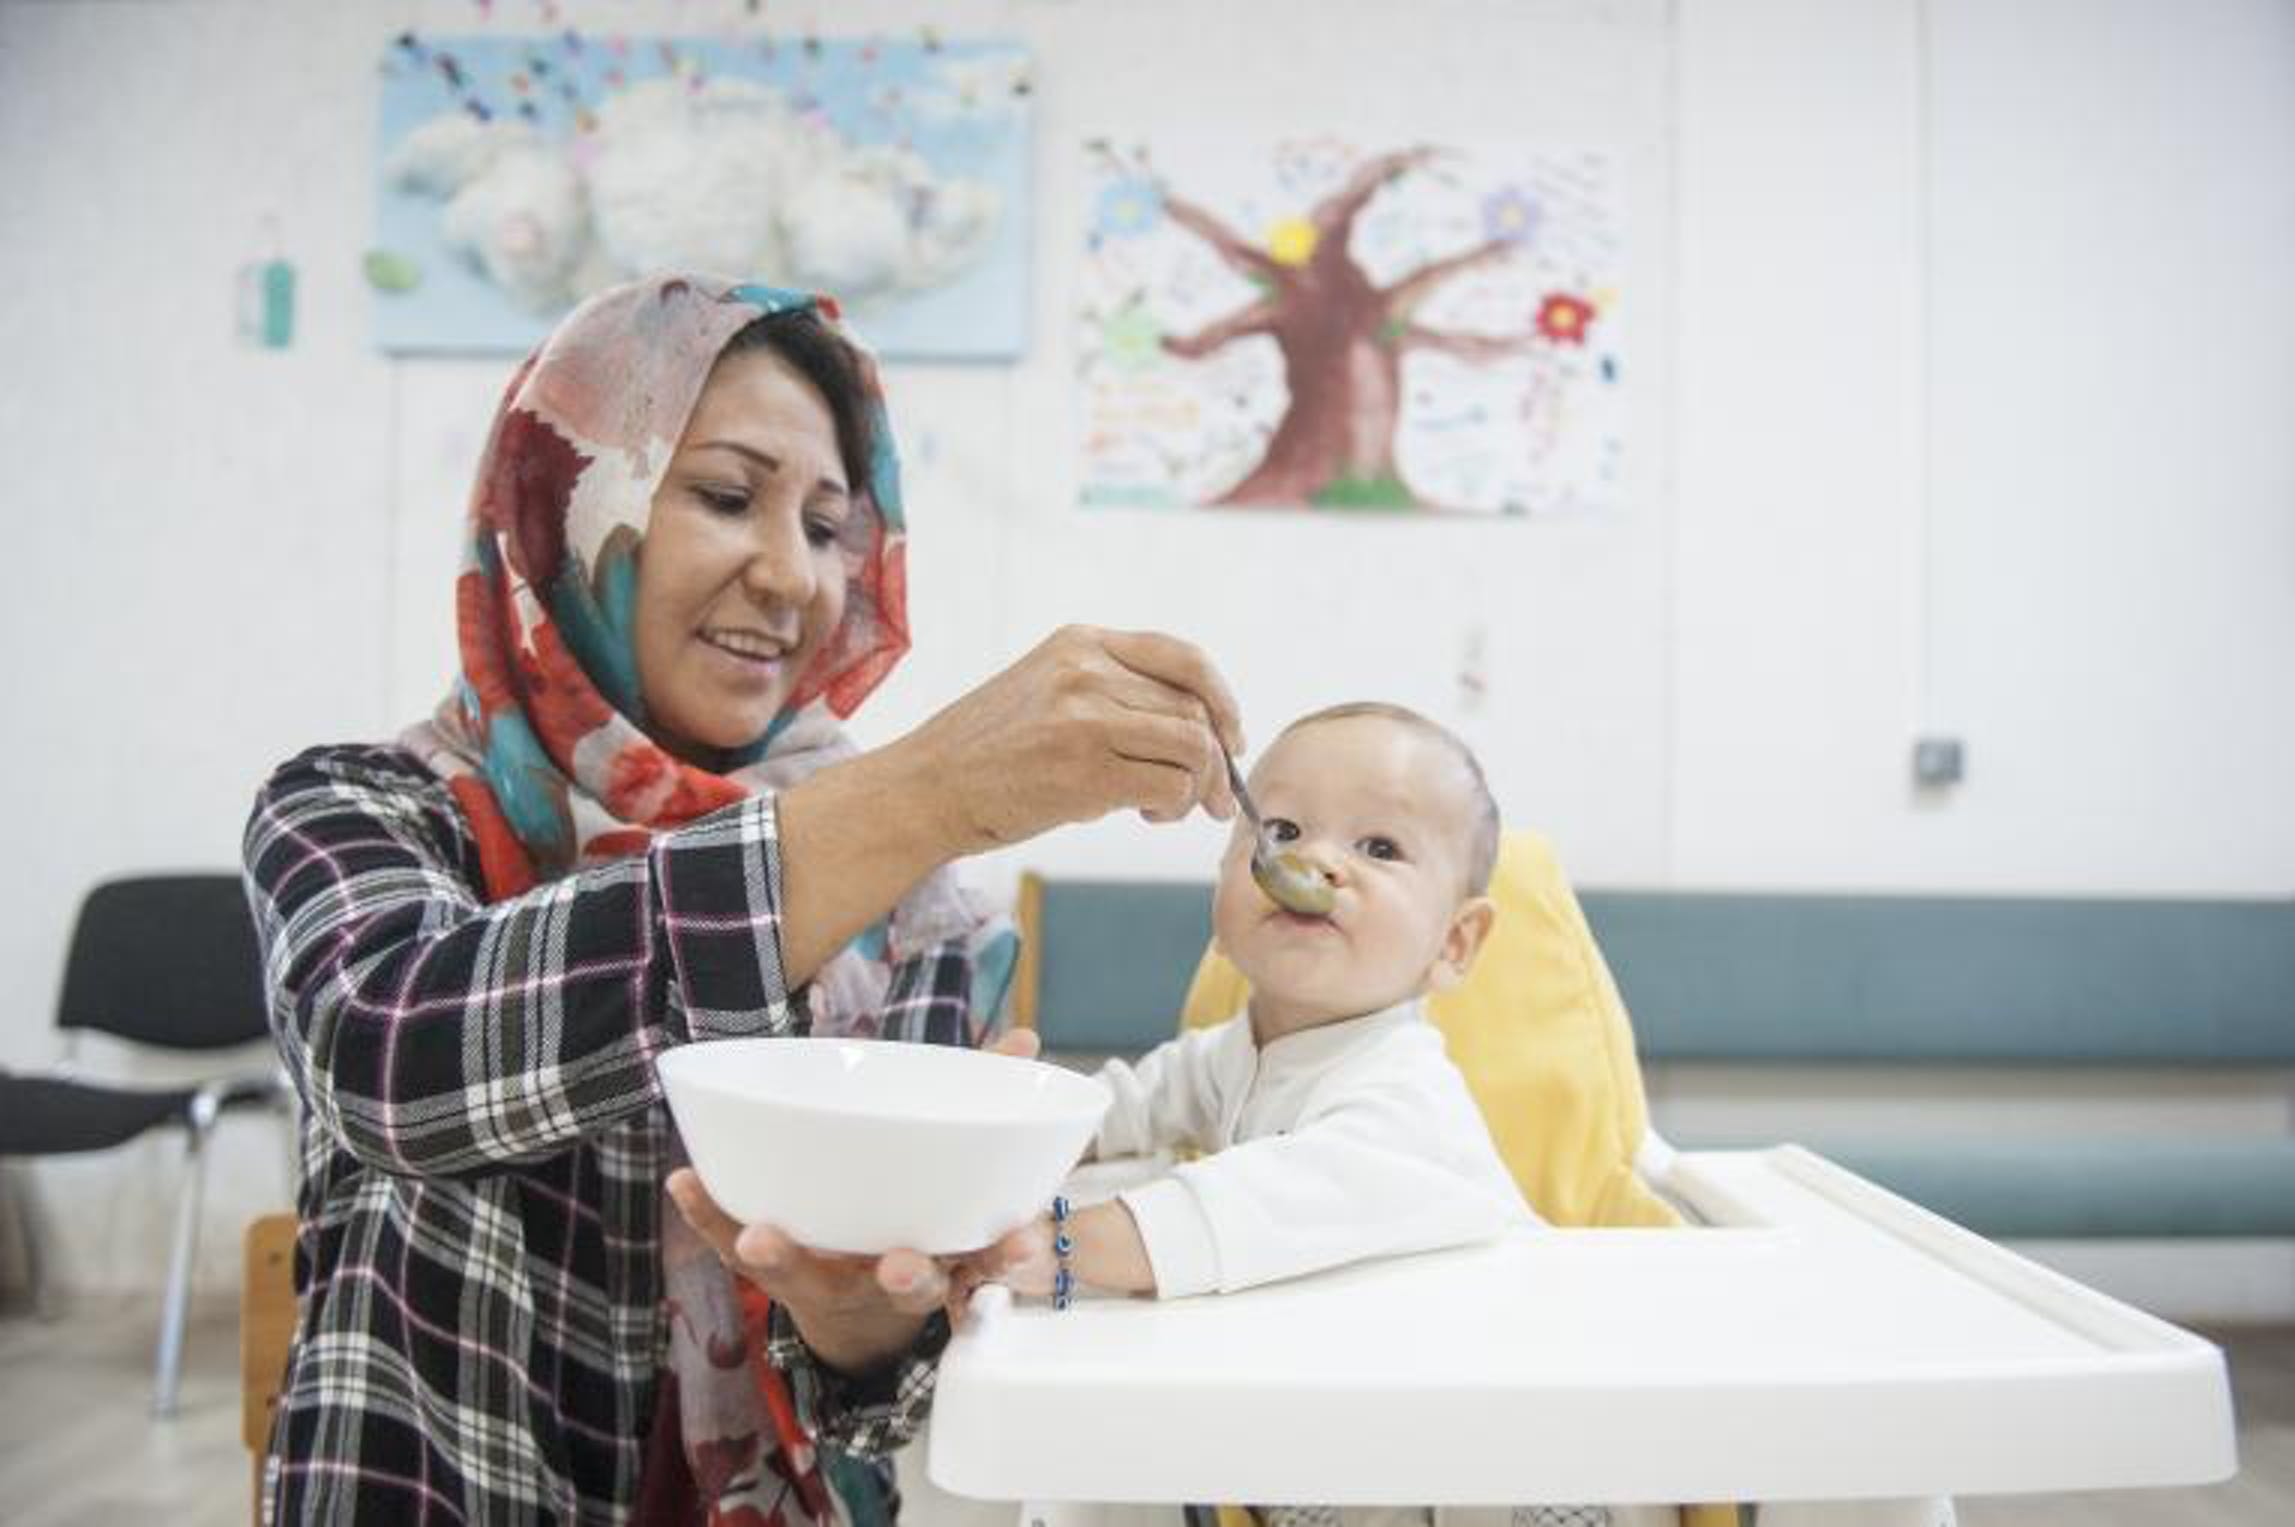 © UNICEF/UNI220342/Pancic